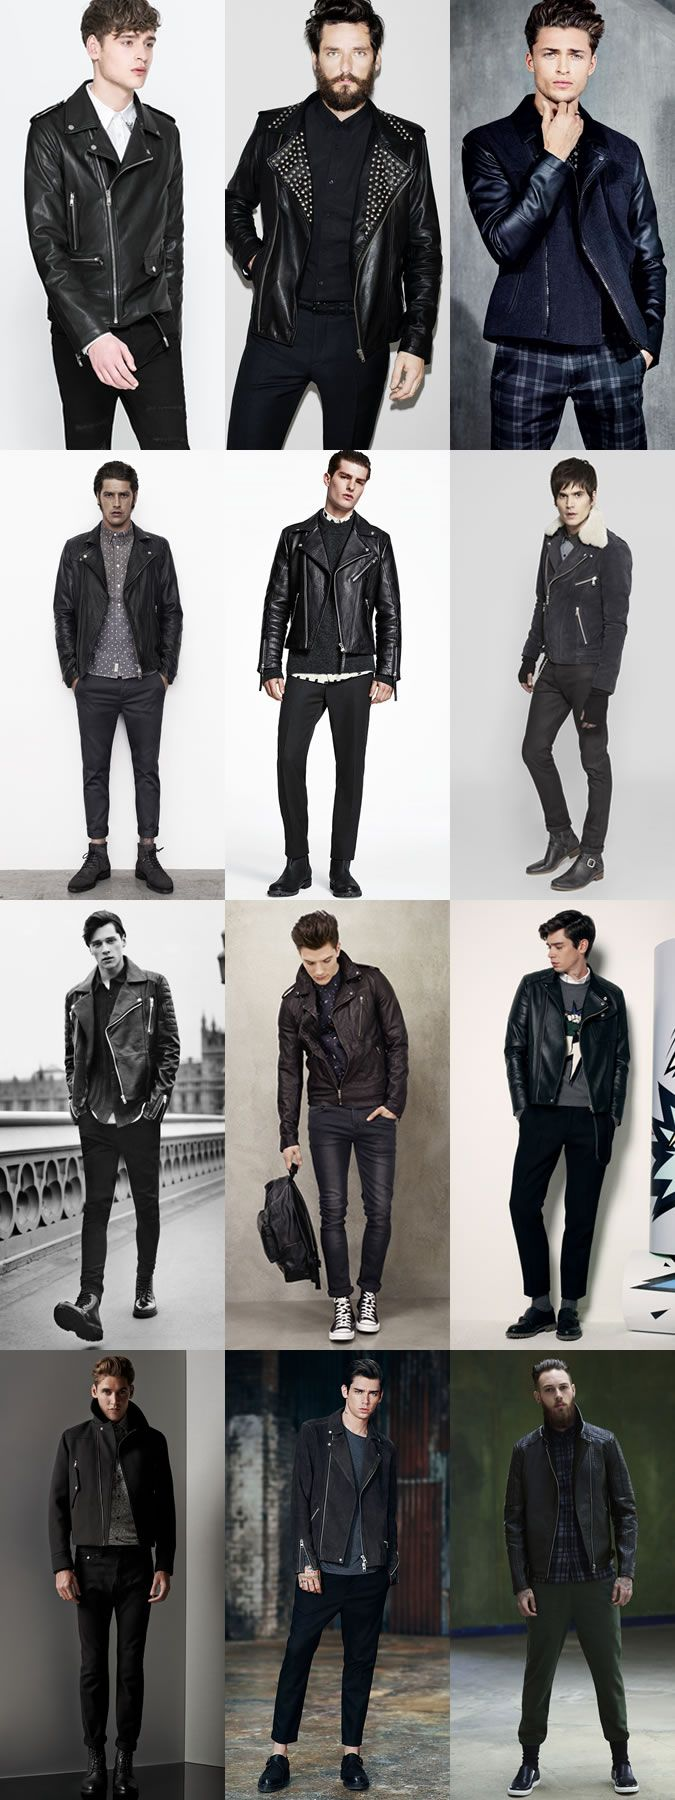 Men's 2014 Autumn/Winter Fashion Trend: Punk-Inspired The Biker Jacket Style Lookbook Inspiration